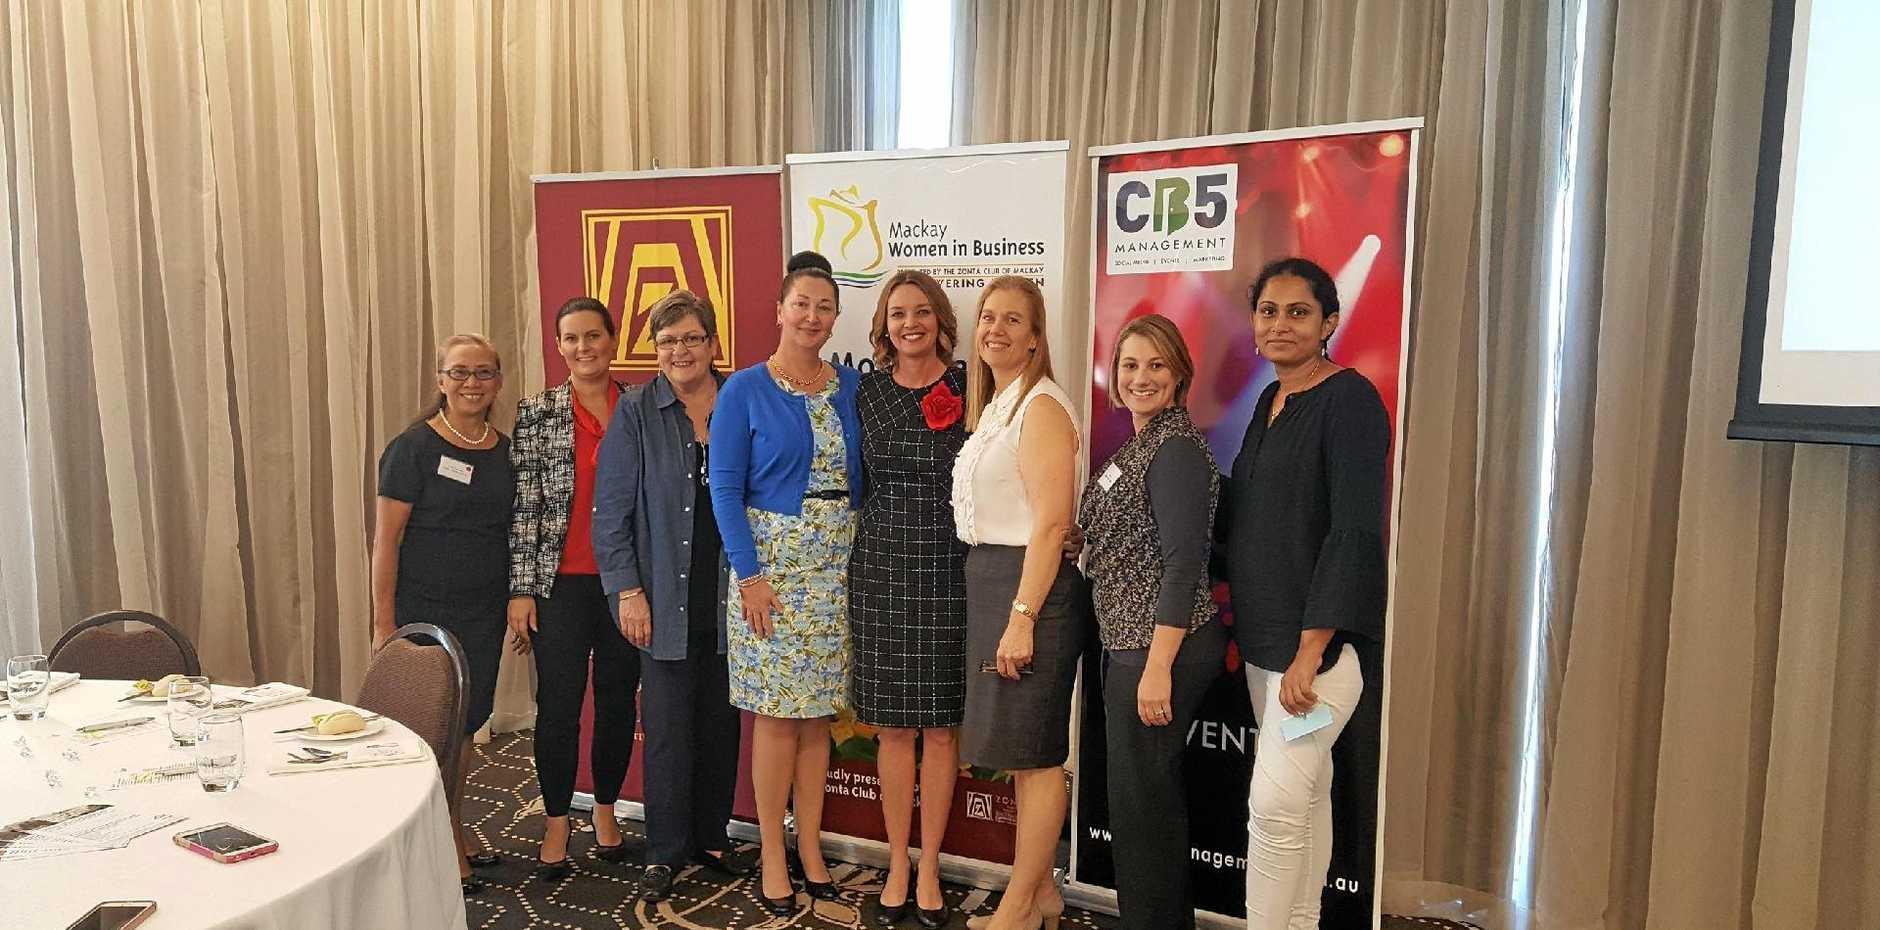 WOMEN IN BUSINESS: Vivien Hanrahan, Rebecca Lamb, Nikki Colfs, Judy Spannagle, Leanne Druery, Jennifer Hickey, Wendy Steindl and Abi Karthnik at the Harrup Park event.